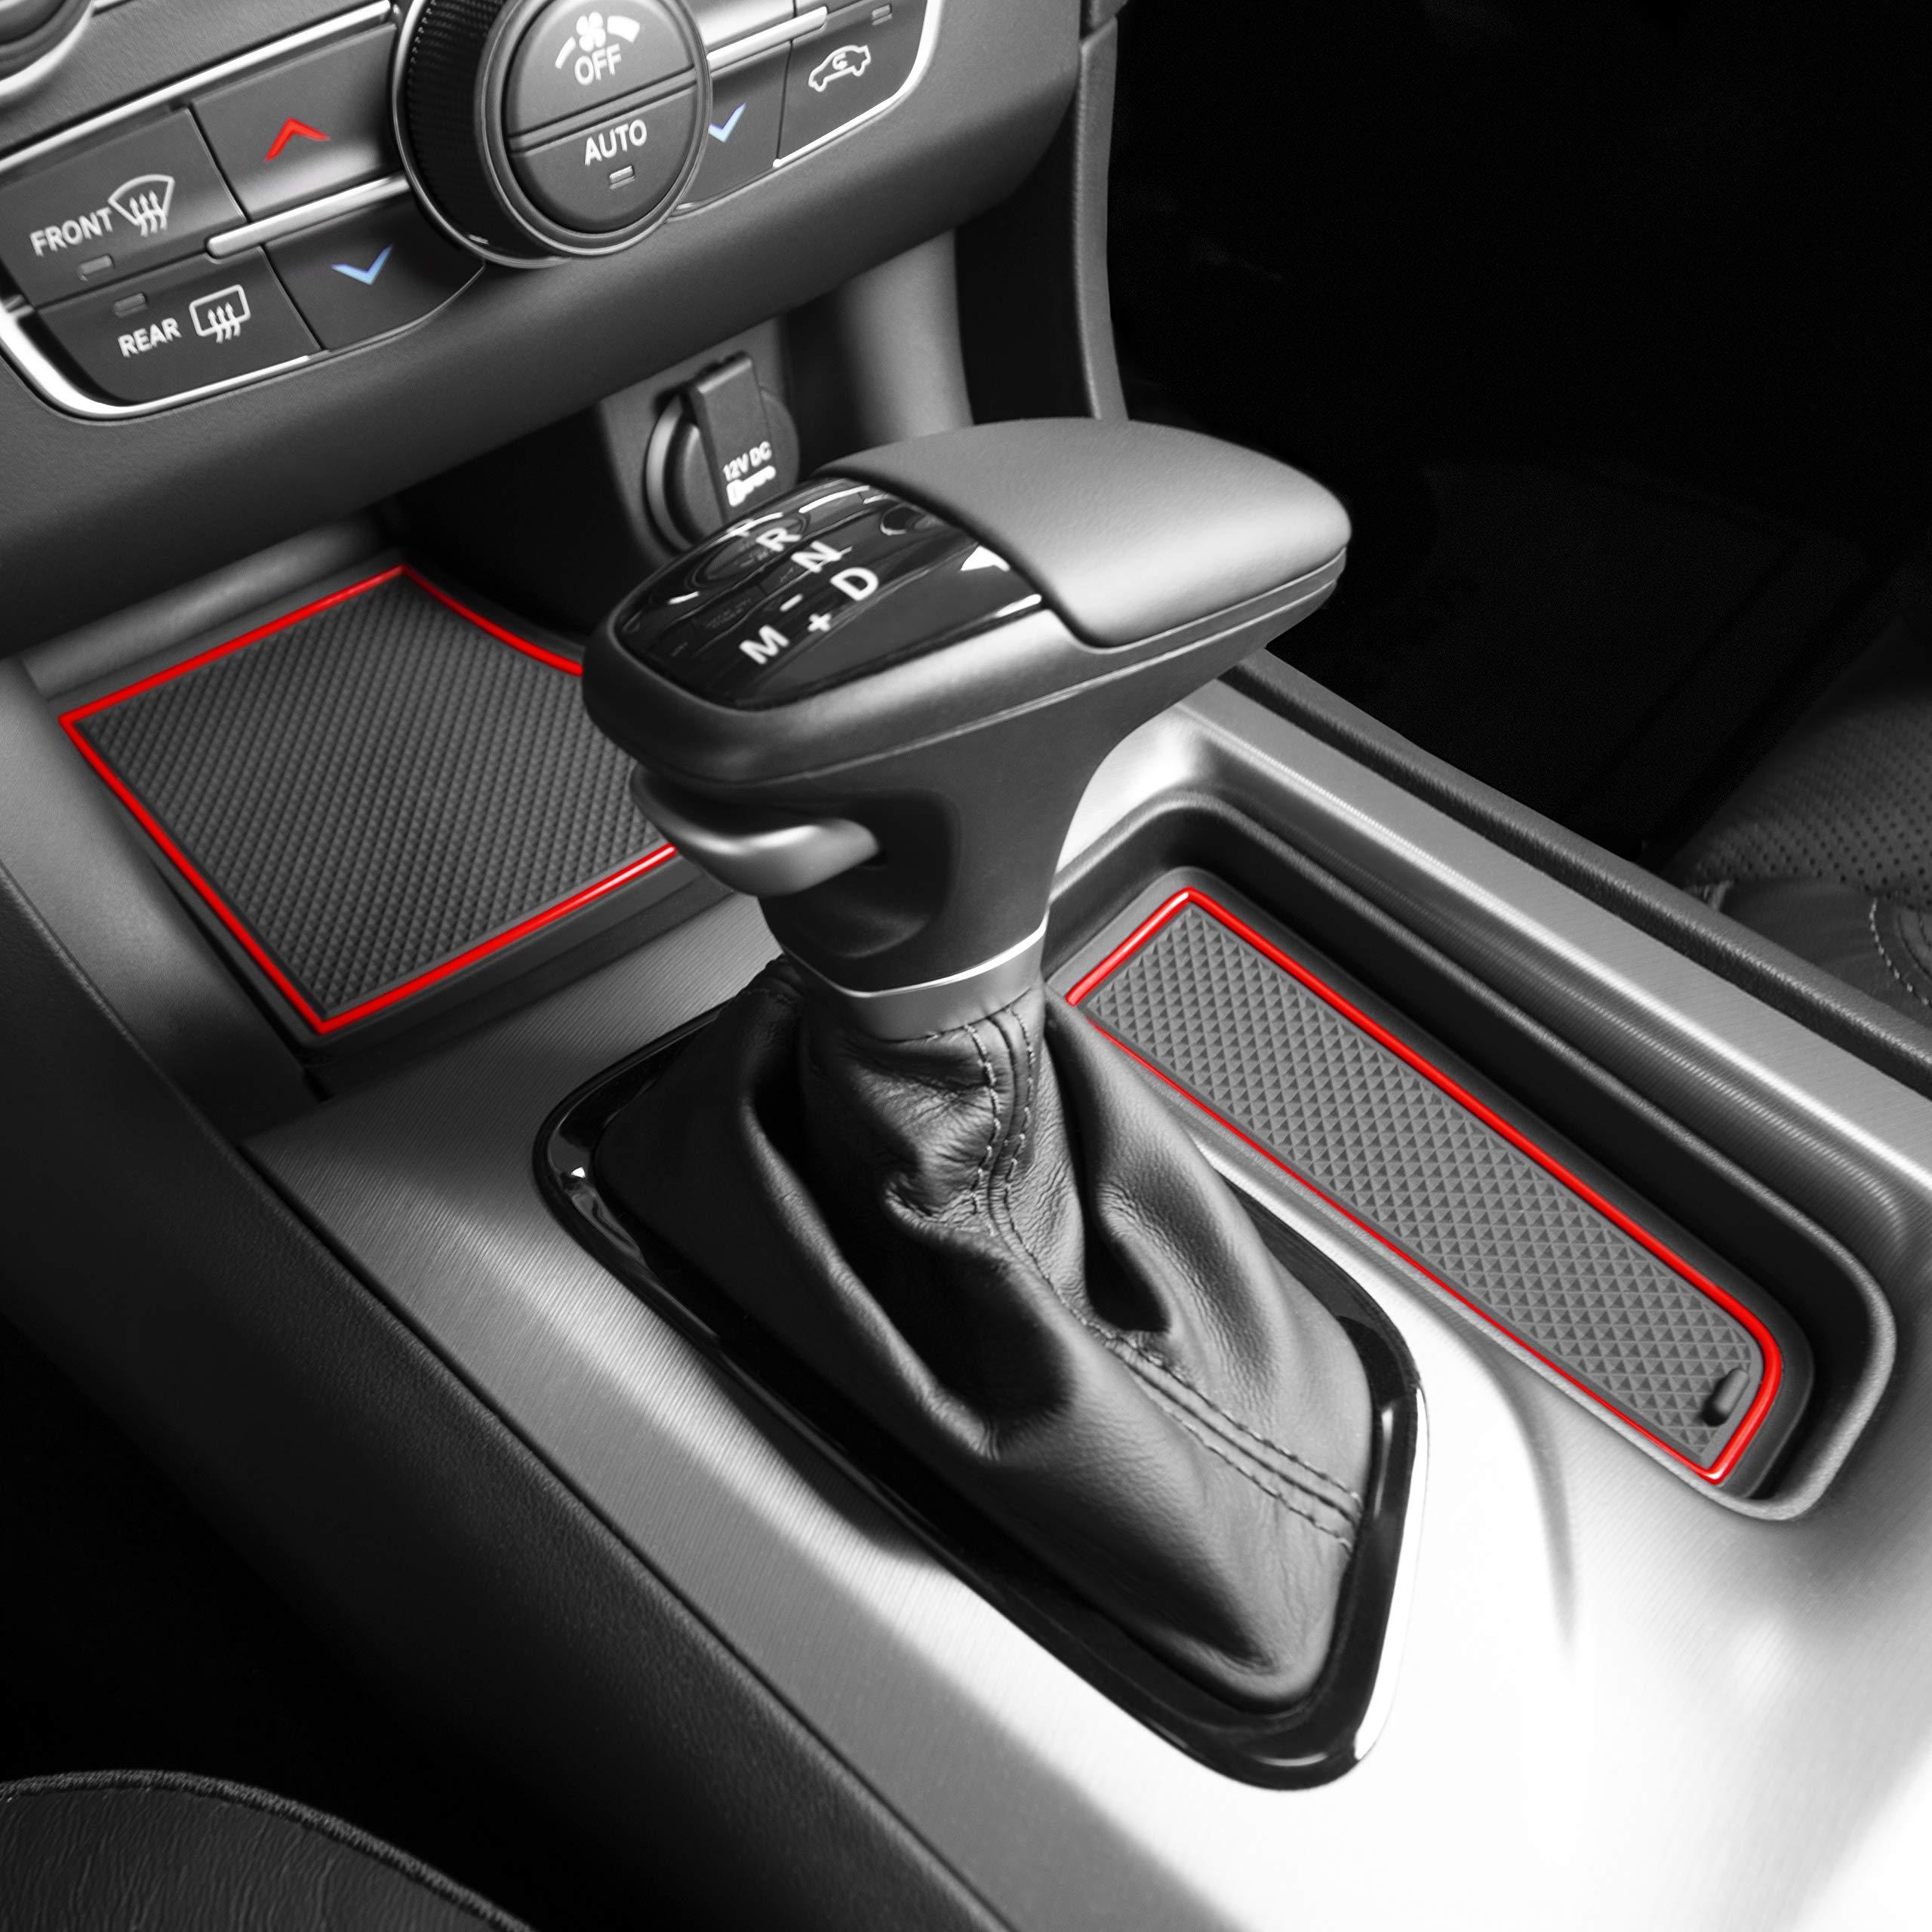 Yoaoo/® 2x Black OEM Original Charger Nameplate Emblems Badges Decal for Dodge Charger Chrysler Mopar Chrome Finish Yoaoo-Do Black